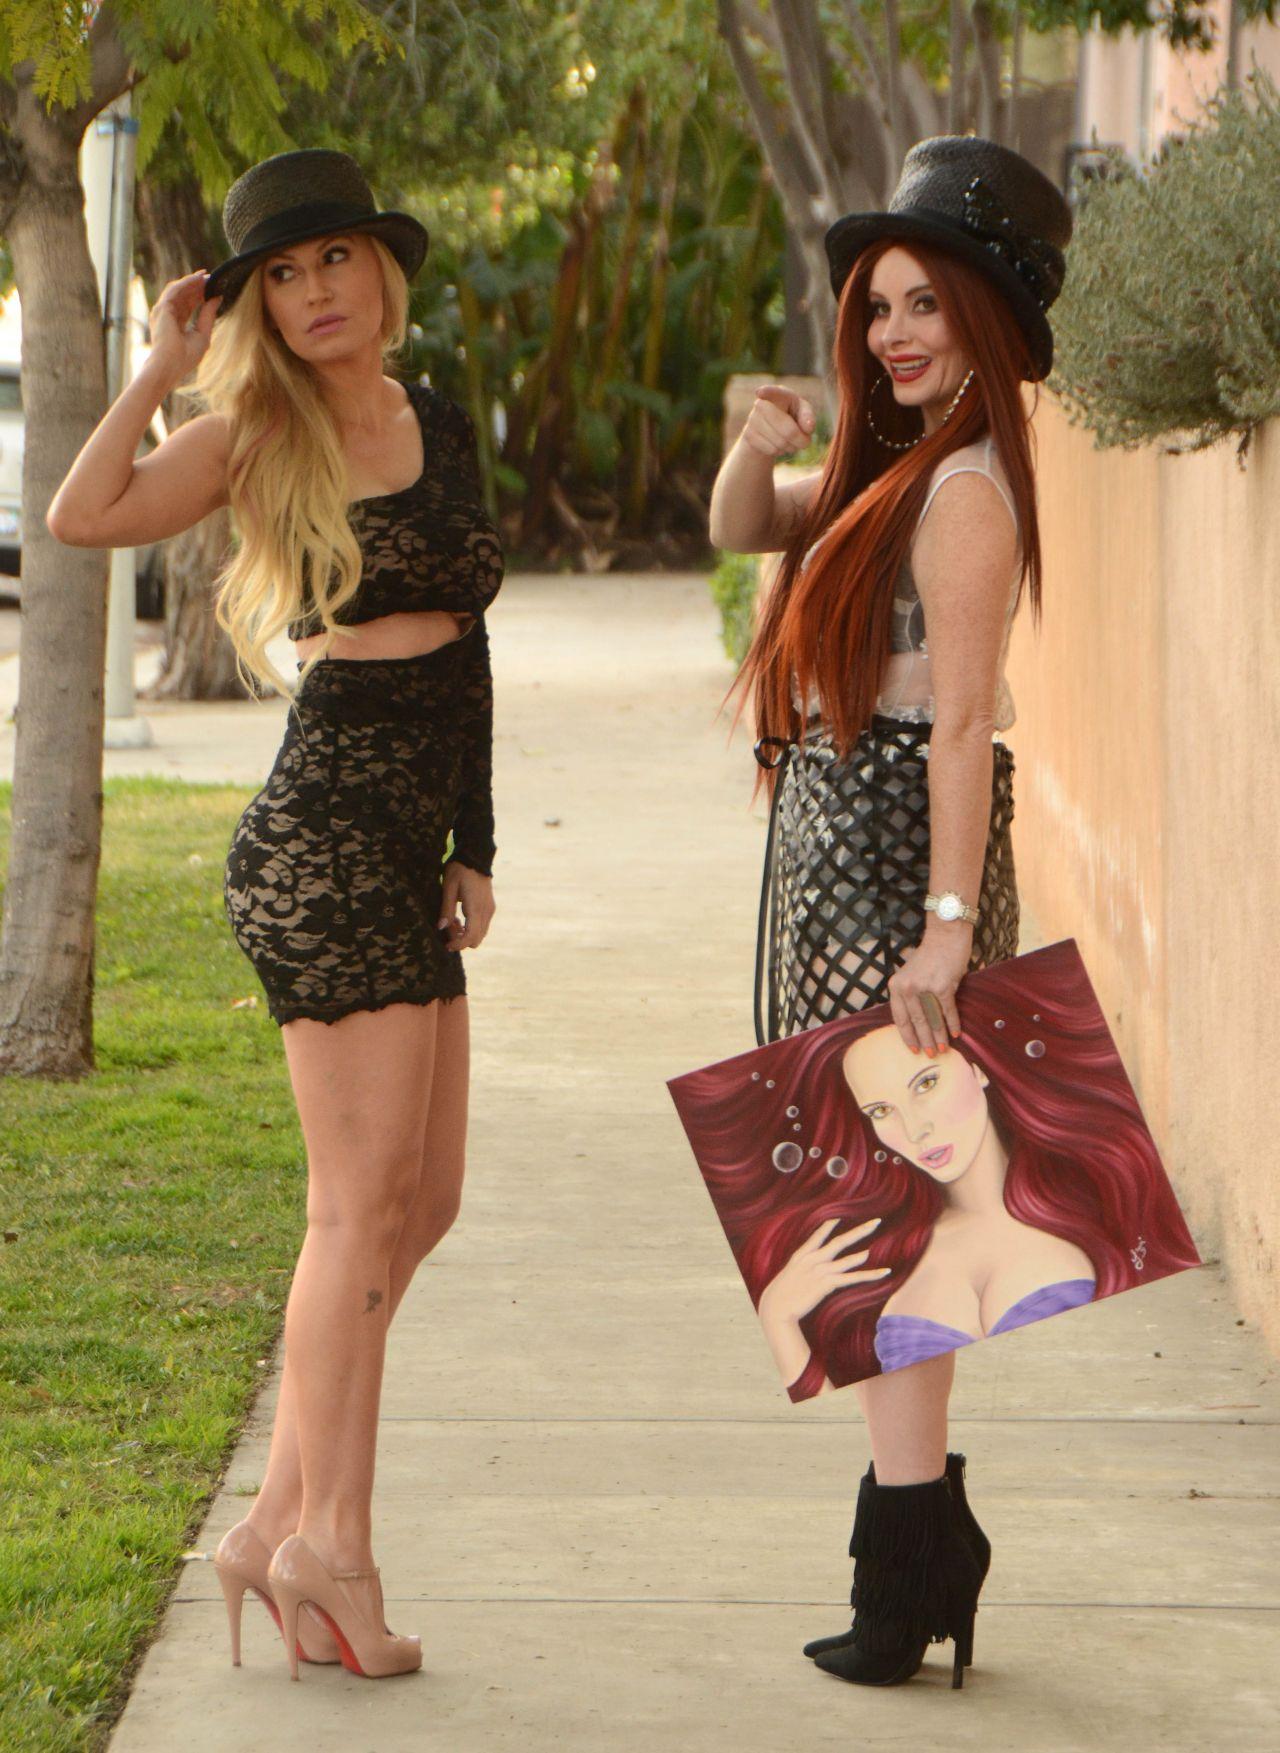 Phoebe Price and Ana Braga - Celebrate National Hat Day in